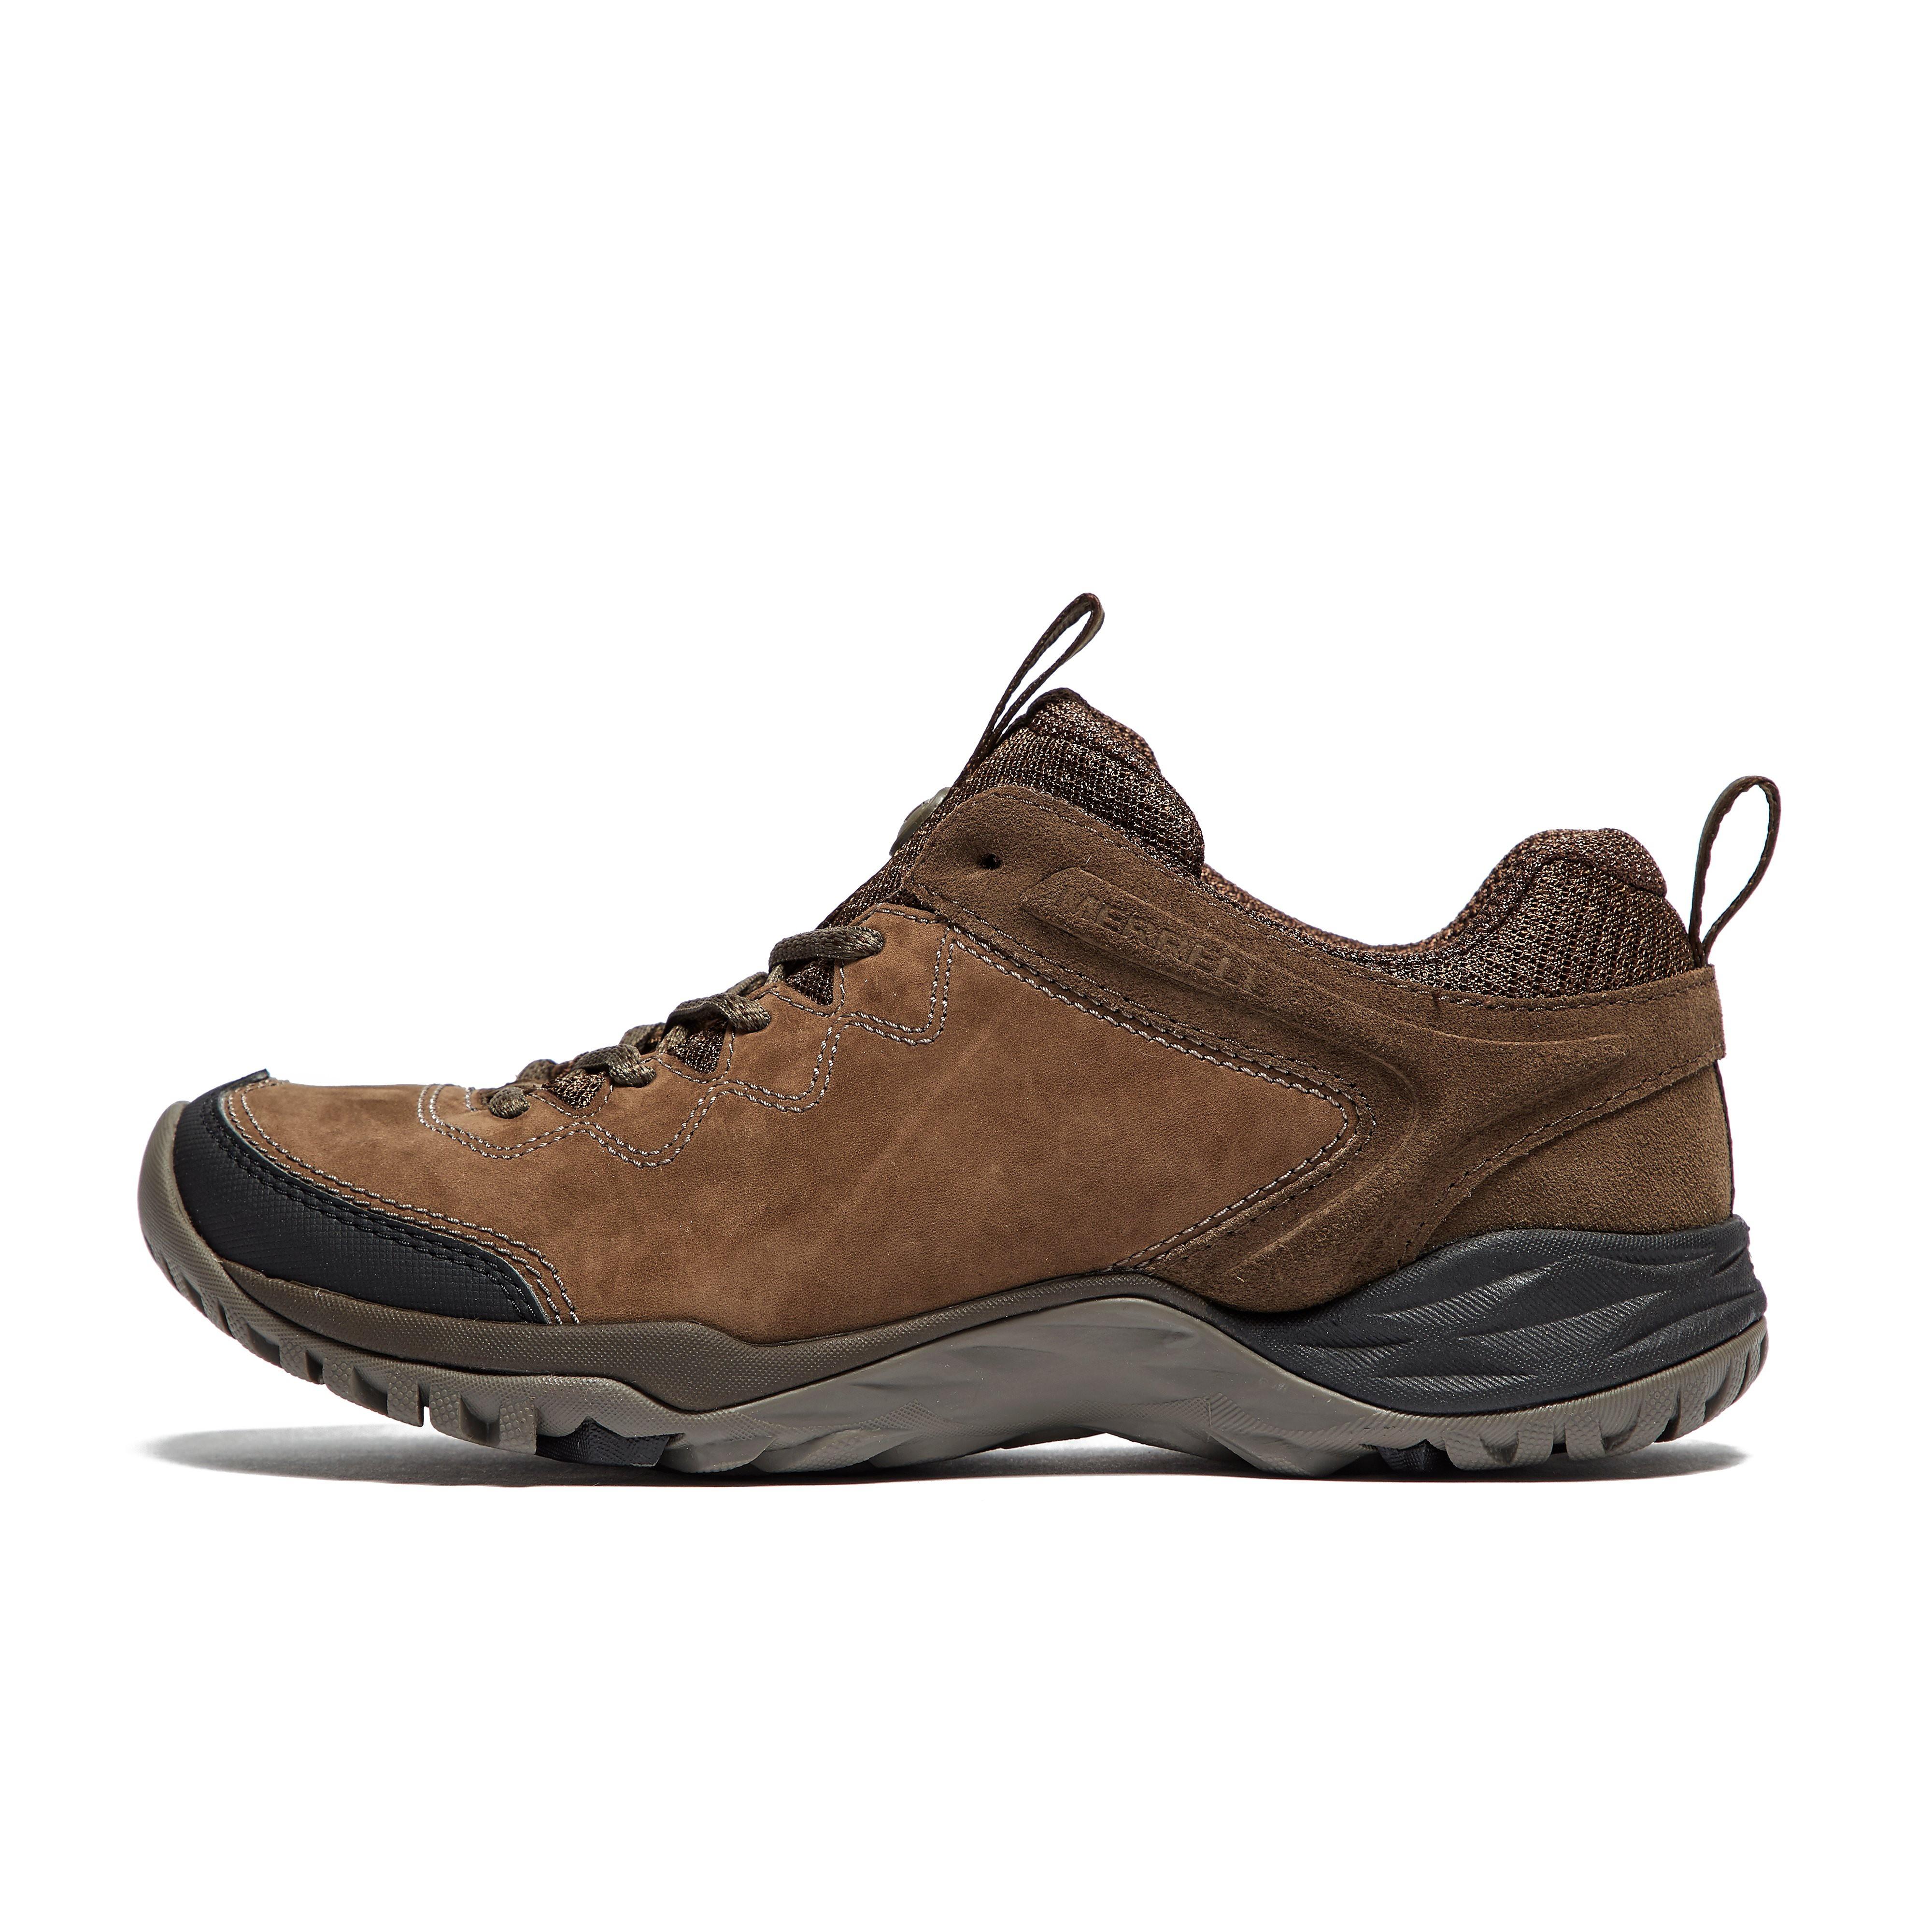 Merrell Siren Traveller Q2 Women's Walking Shoes